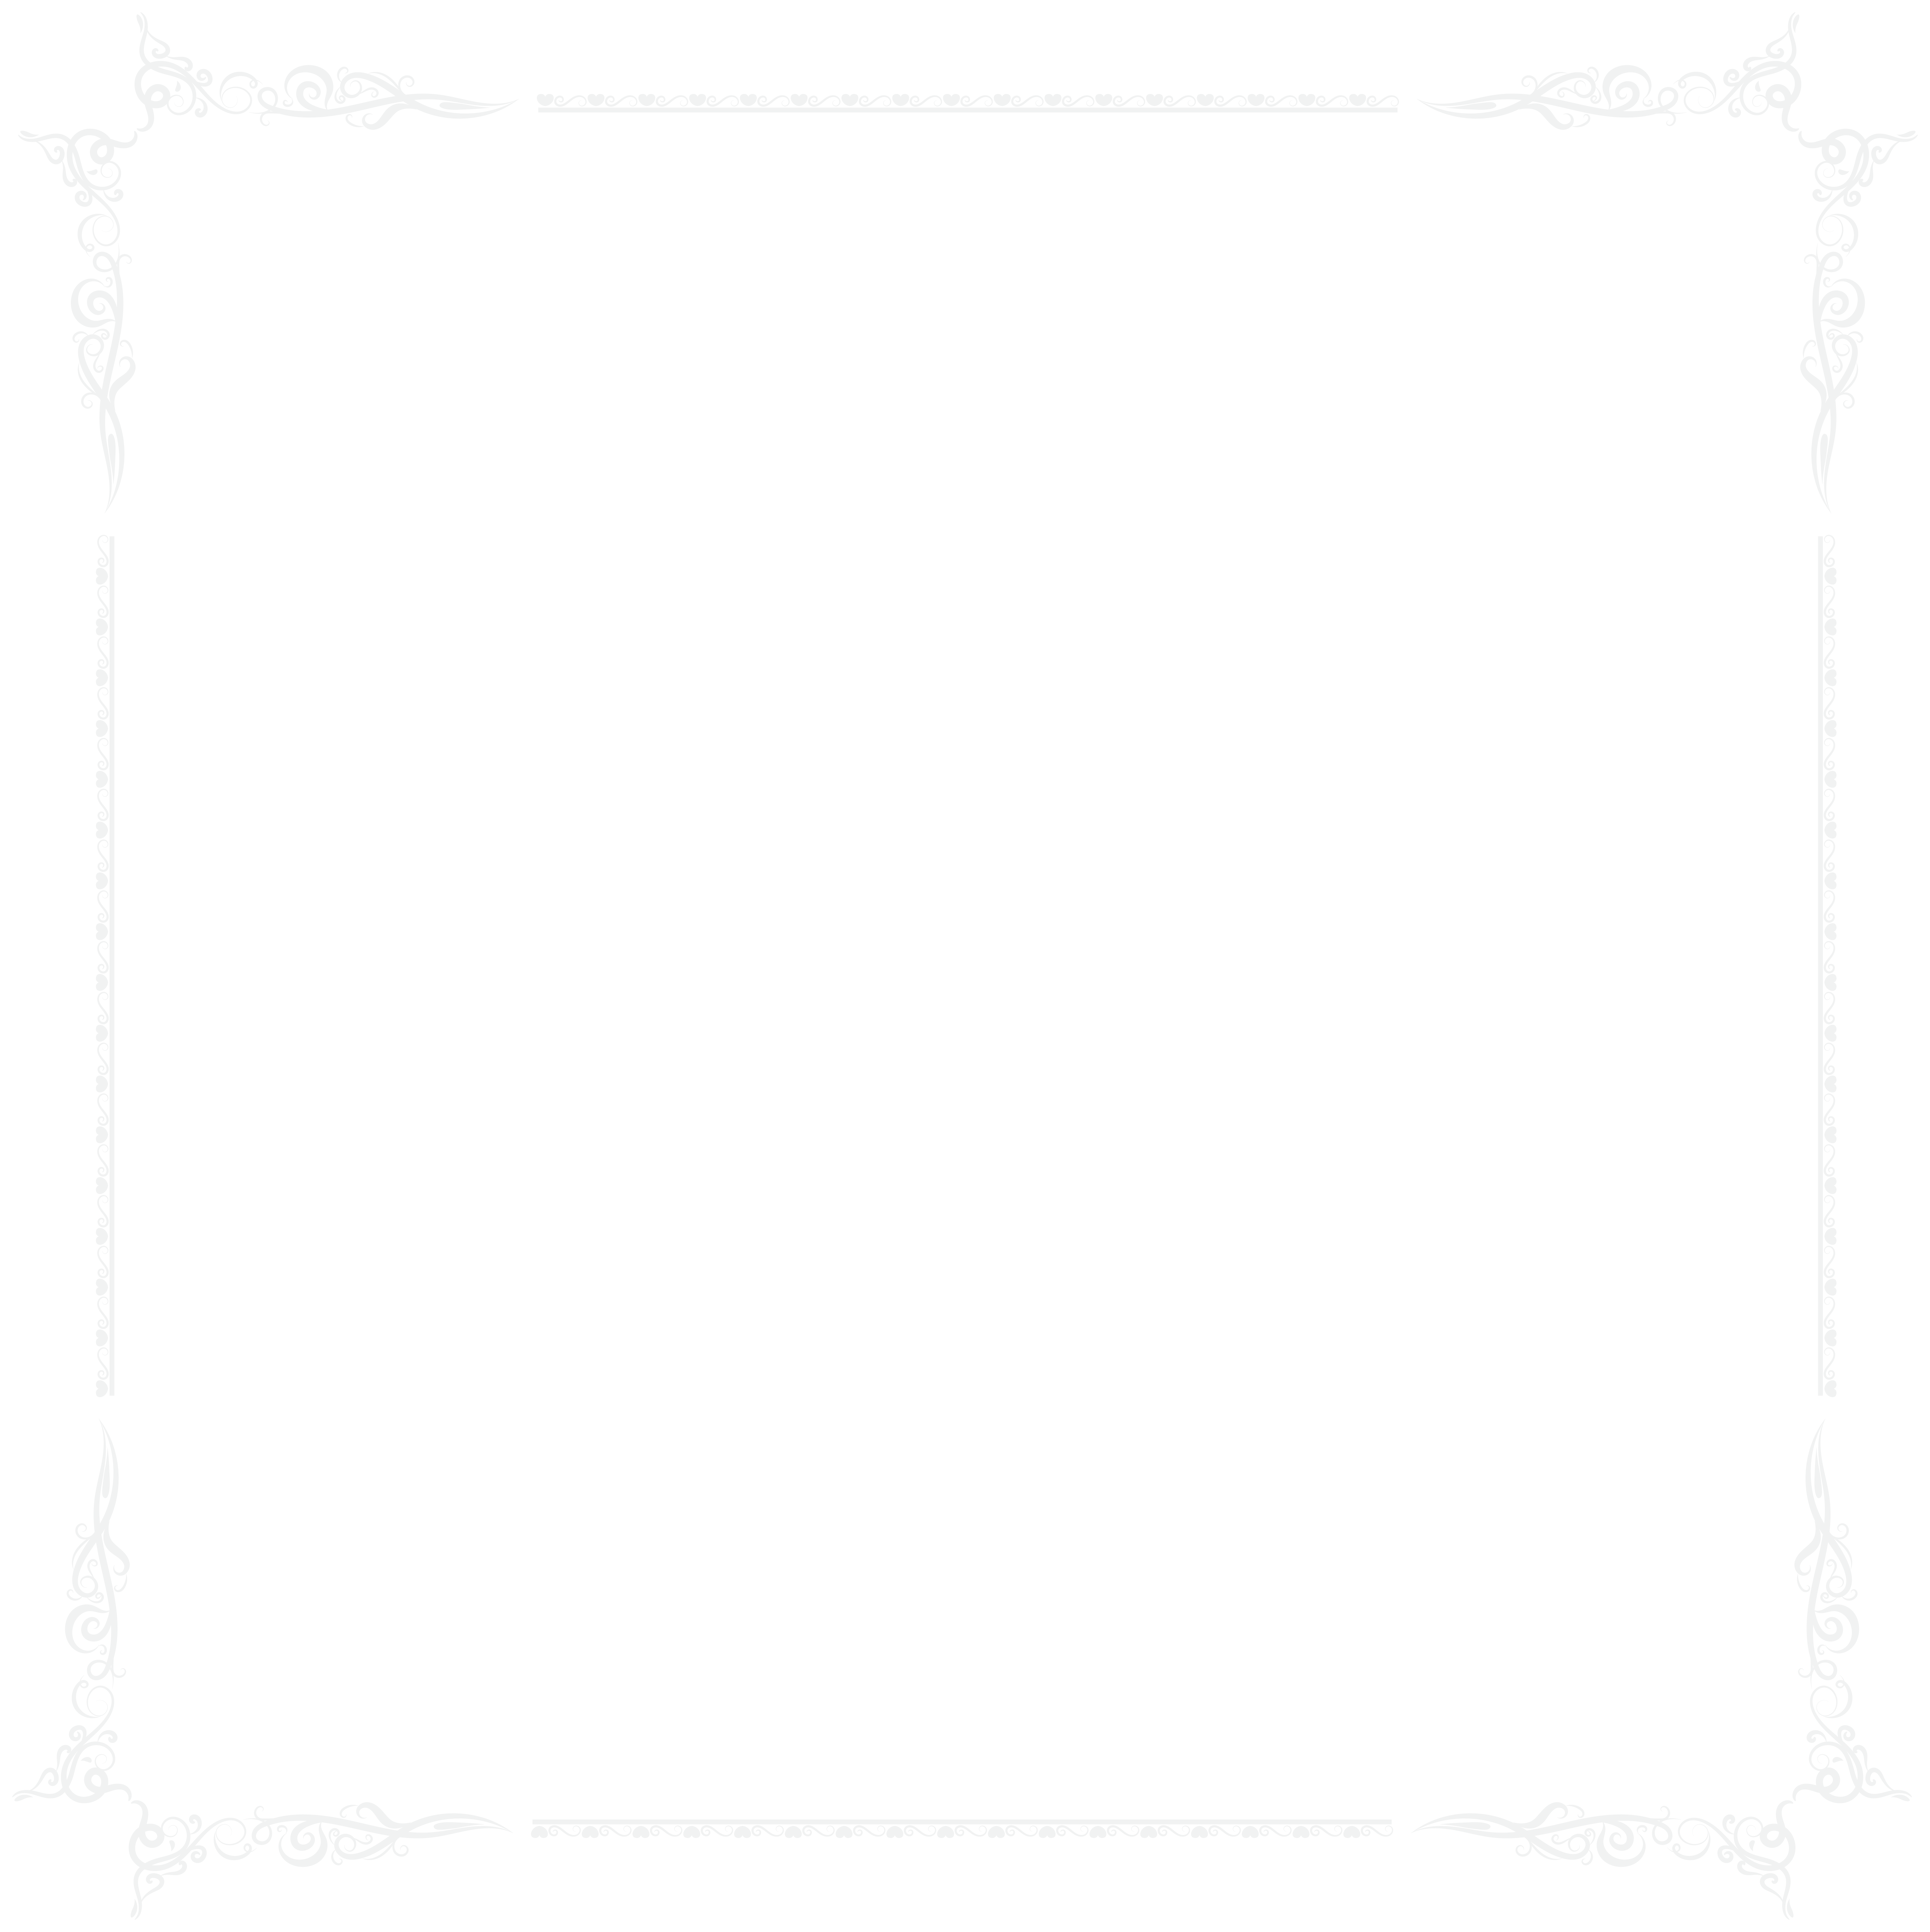 Frame transparent clip art. White border png transparency